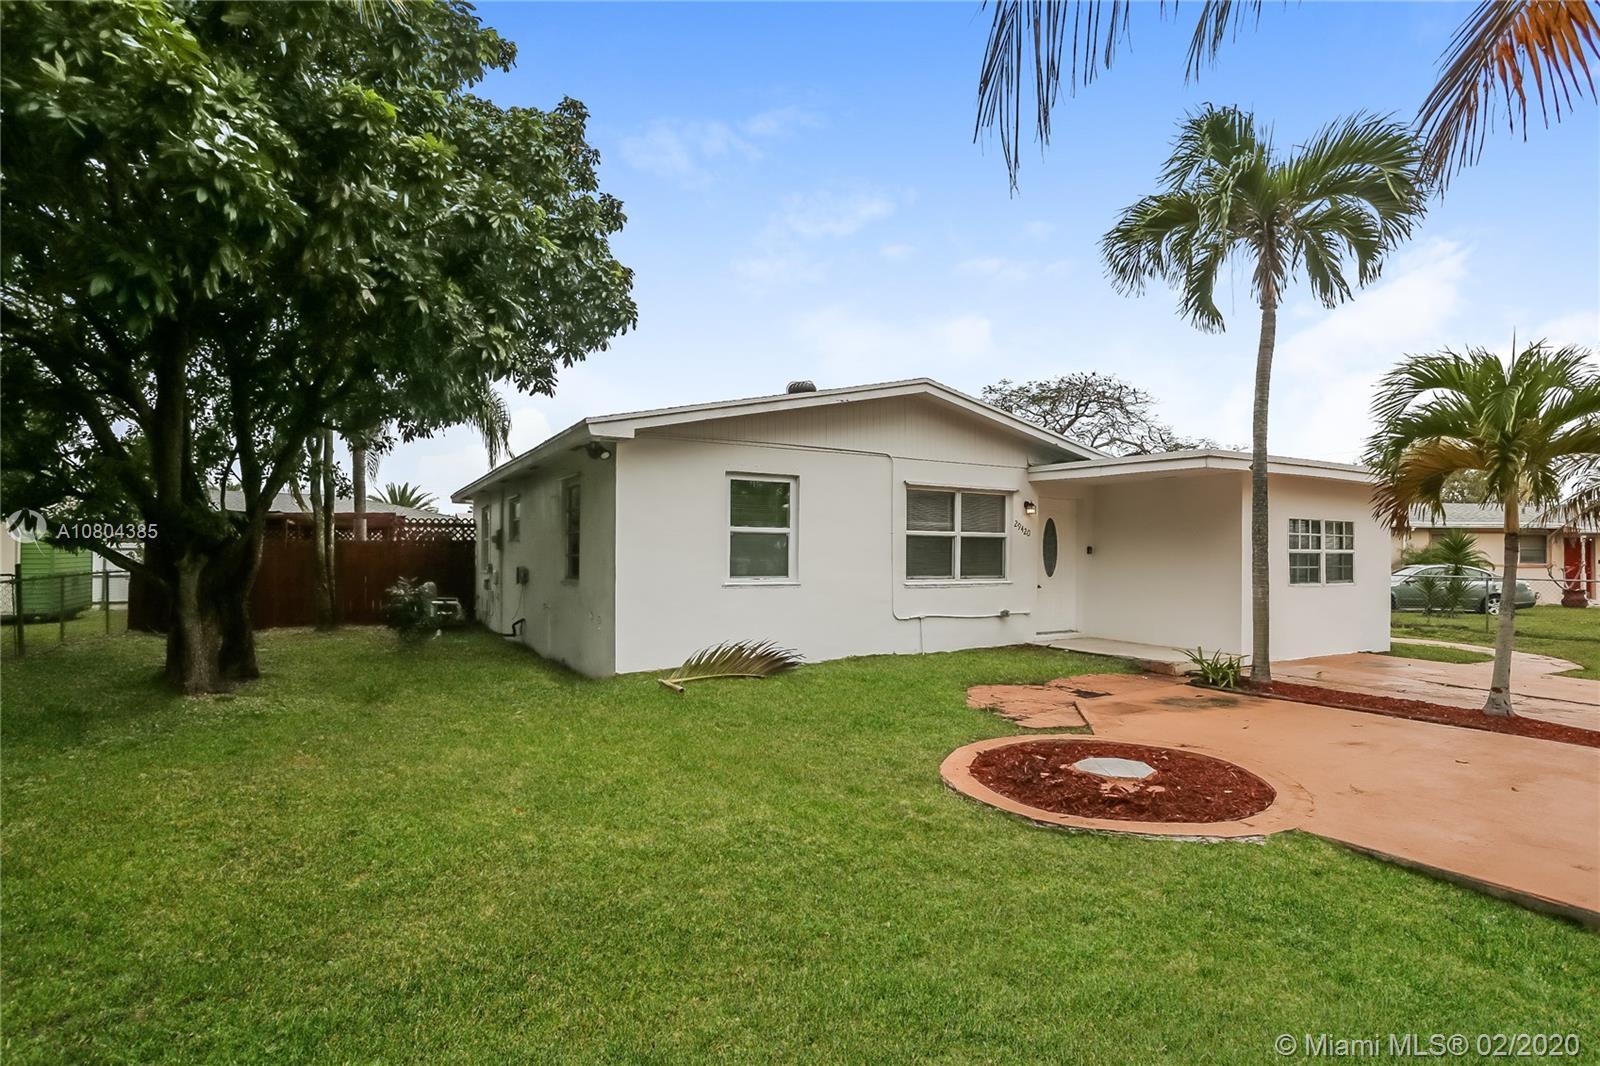 29420 SW 155th Ave, Homestead, FL 33033 - Homestead, FL real estate listing